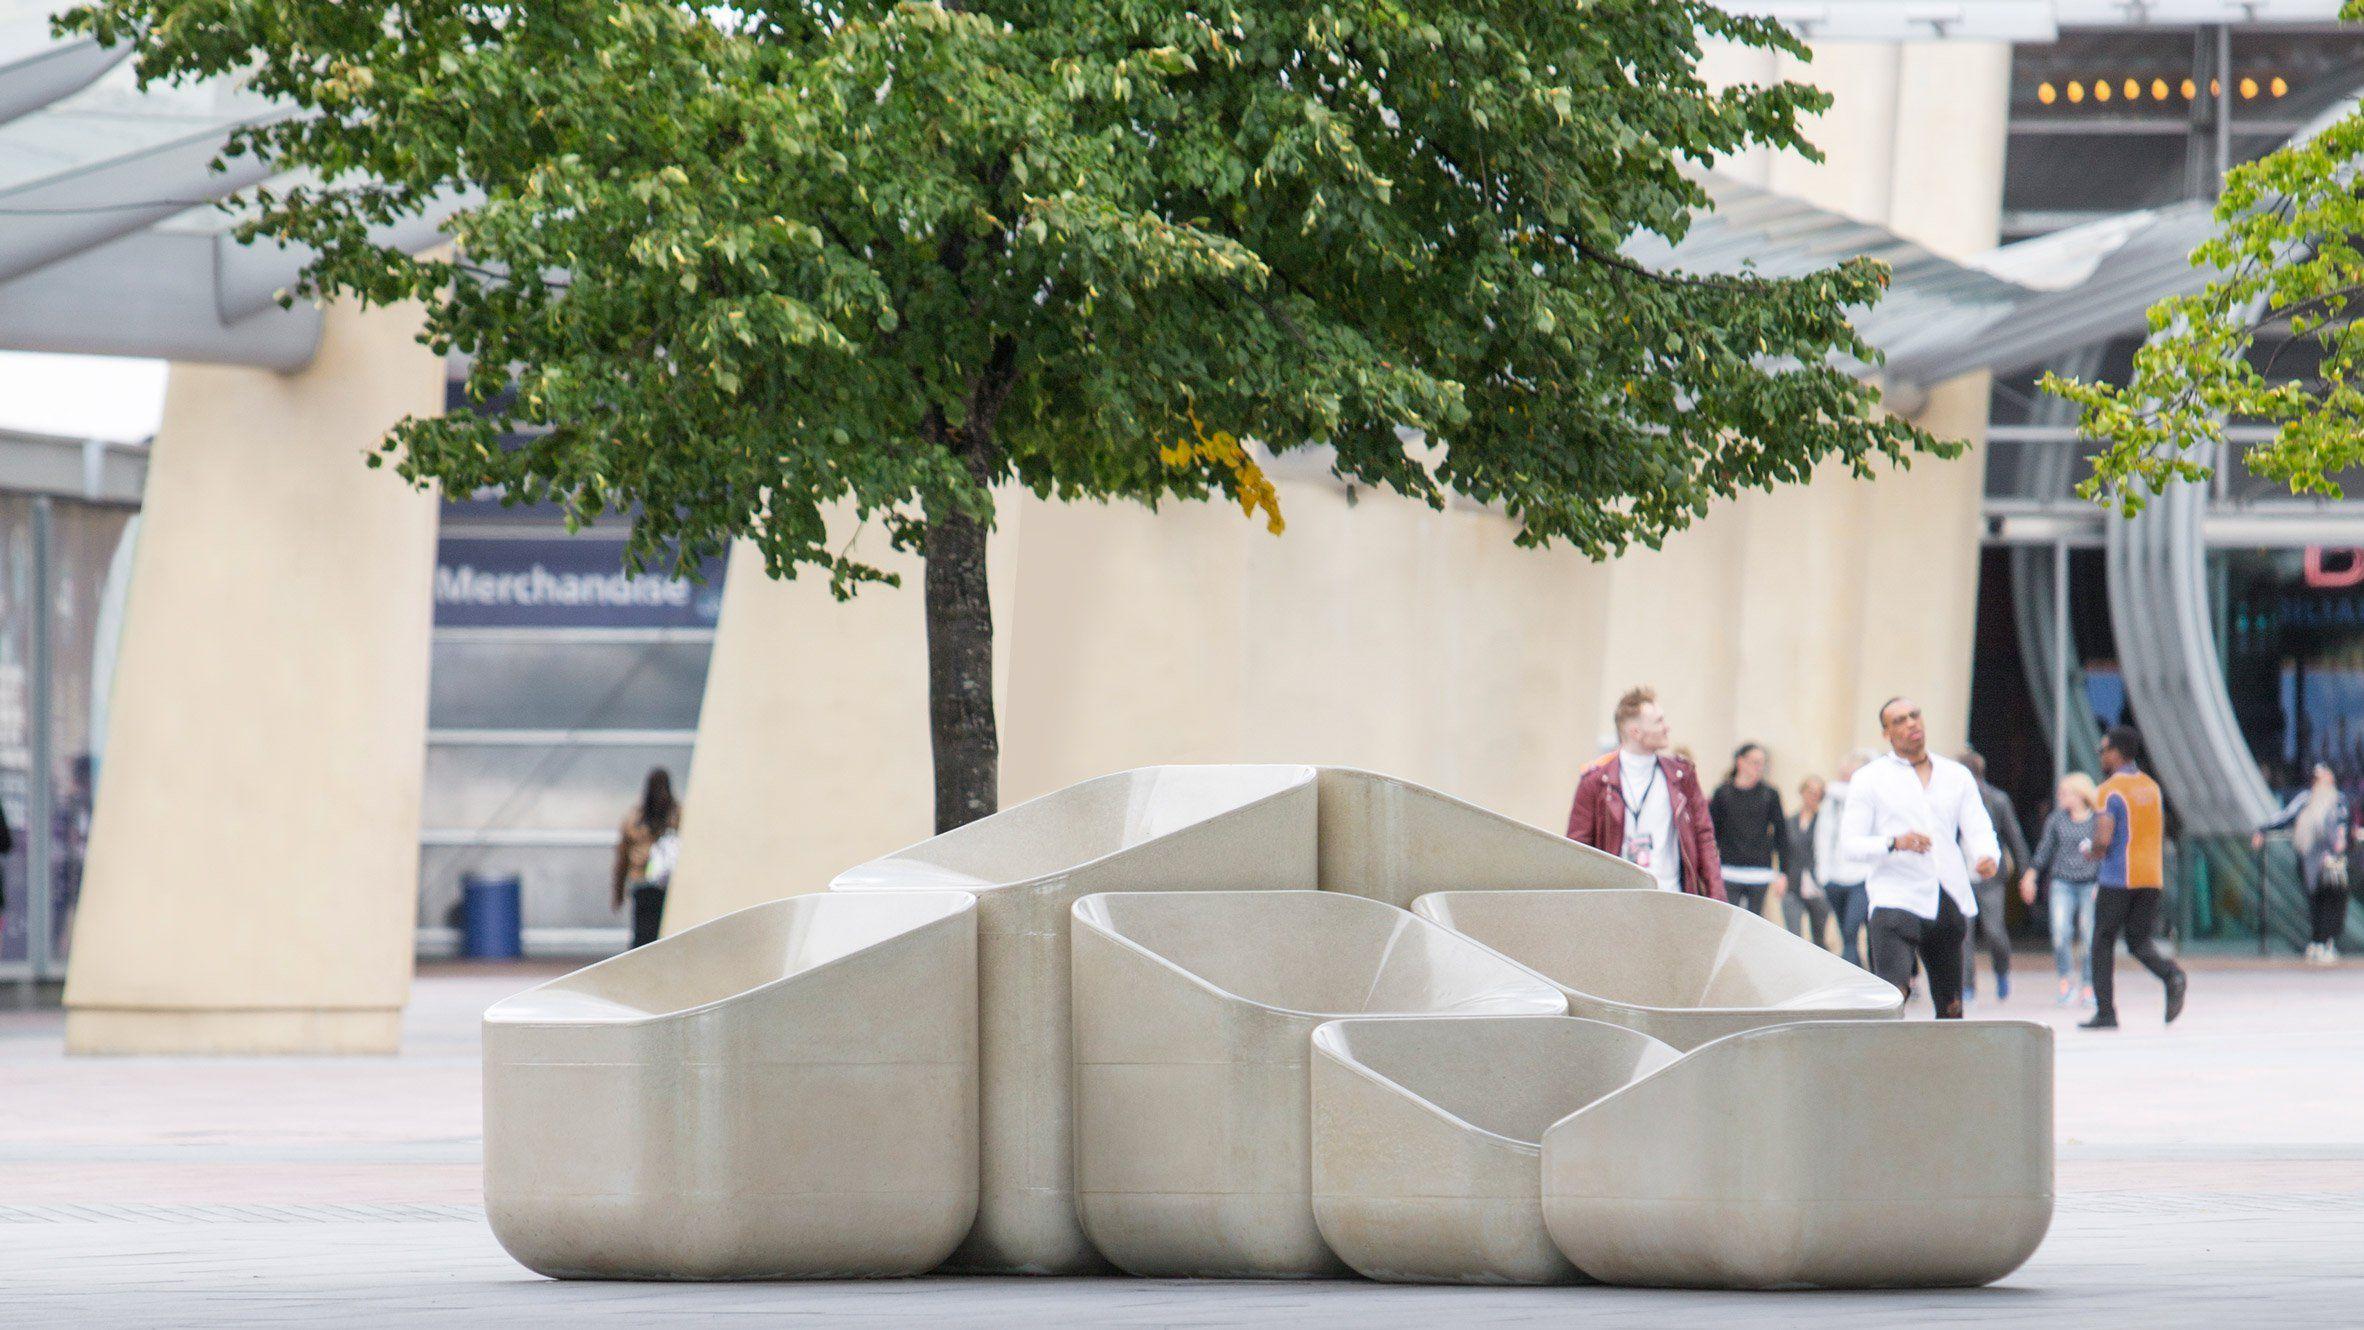 Raw Edges Created Range Of Concrete Street Furniture London' Greenwich Peninsula